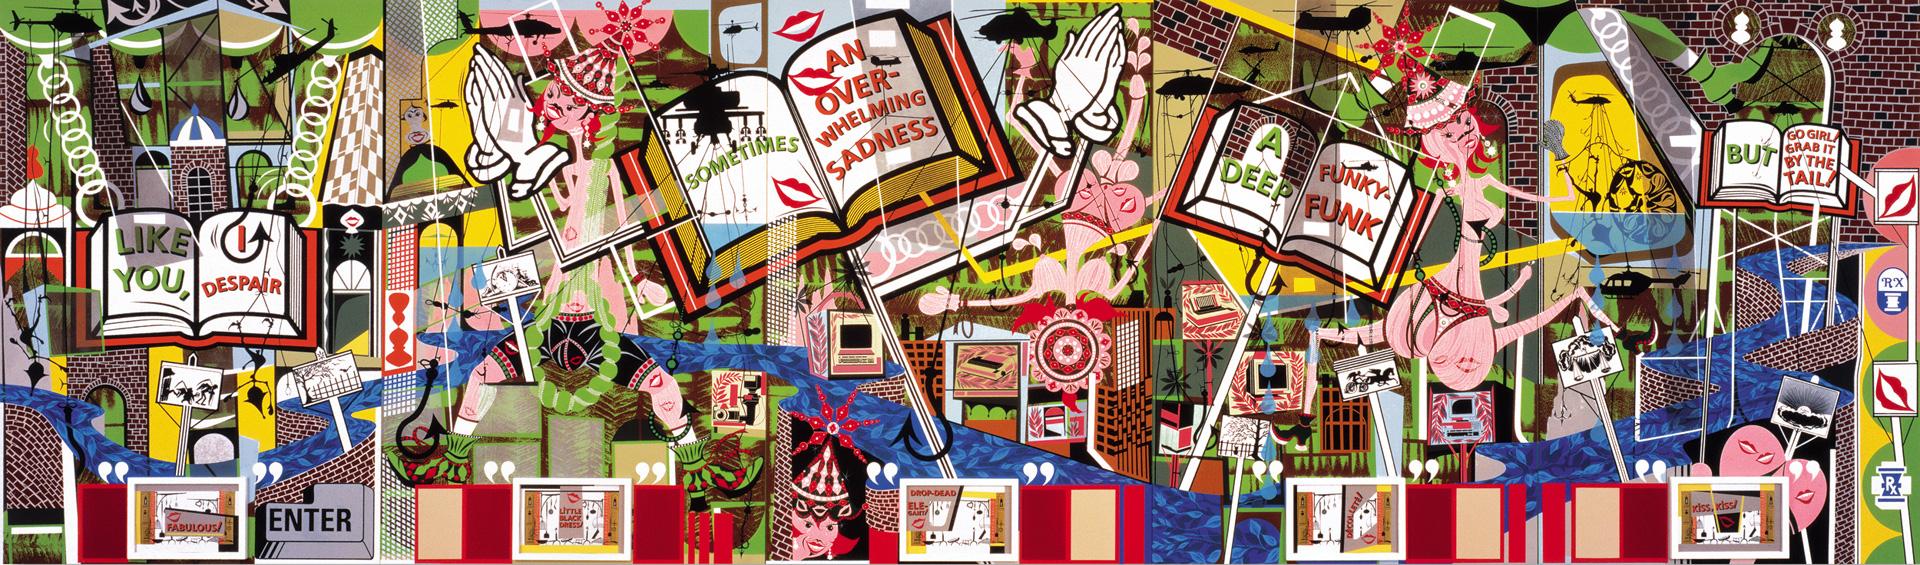 Lari Pittman - Like You, 1995, oil and enamel on five mahogany panels